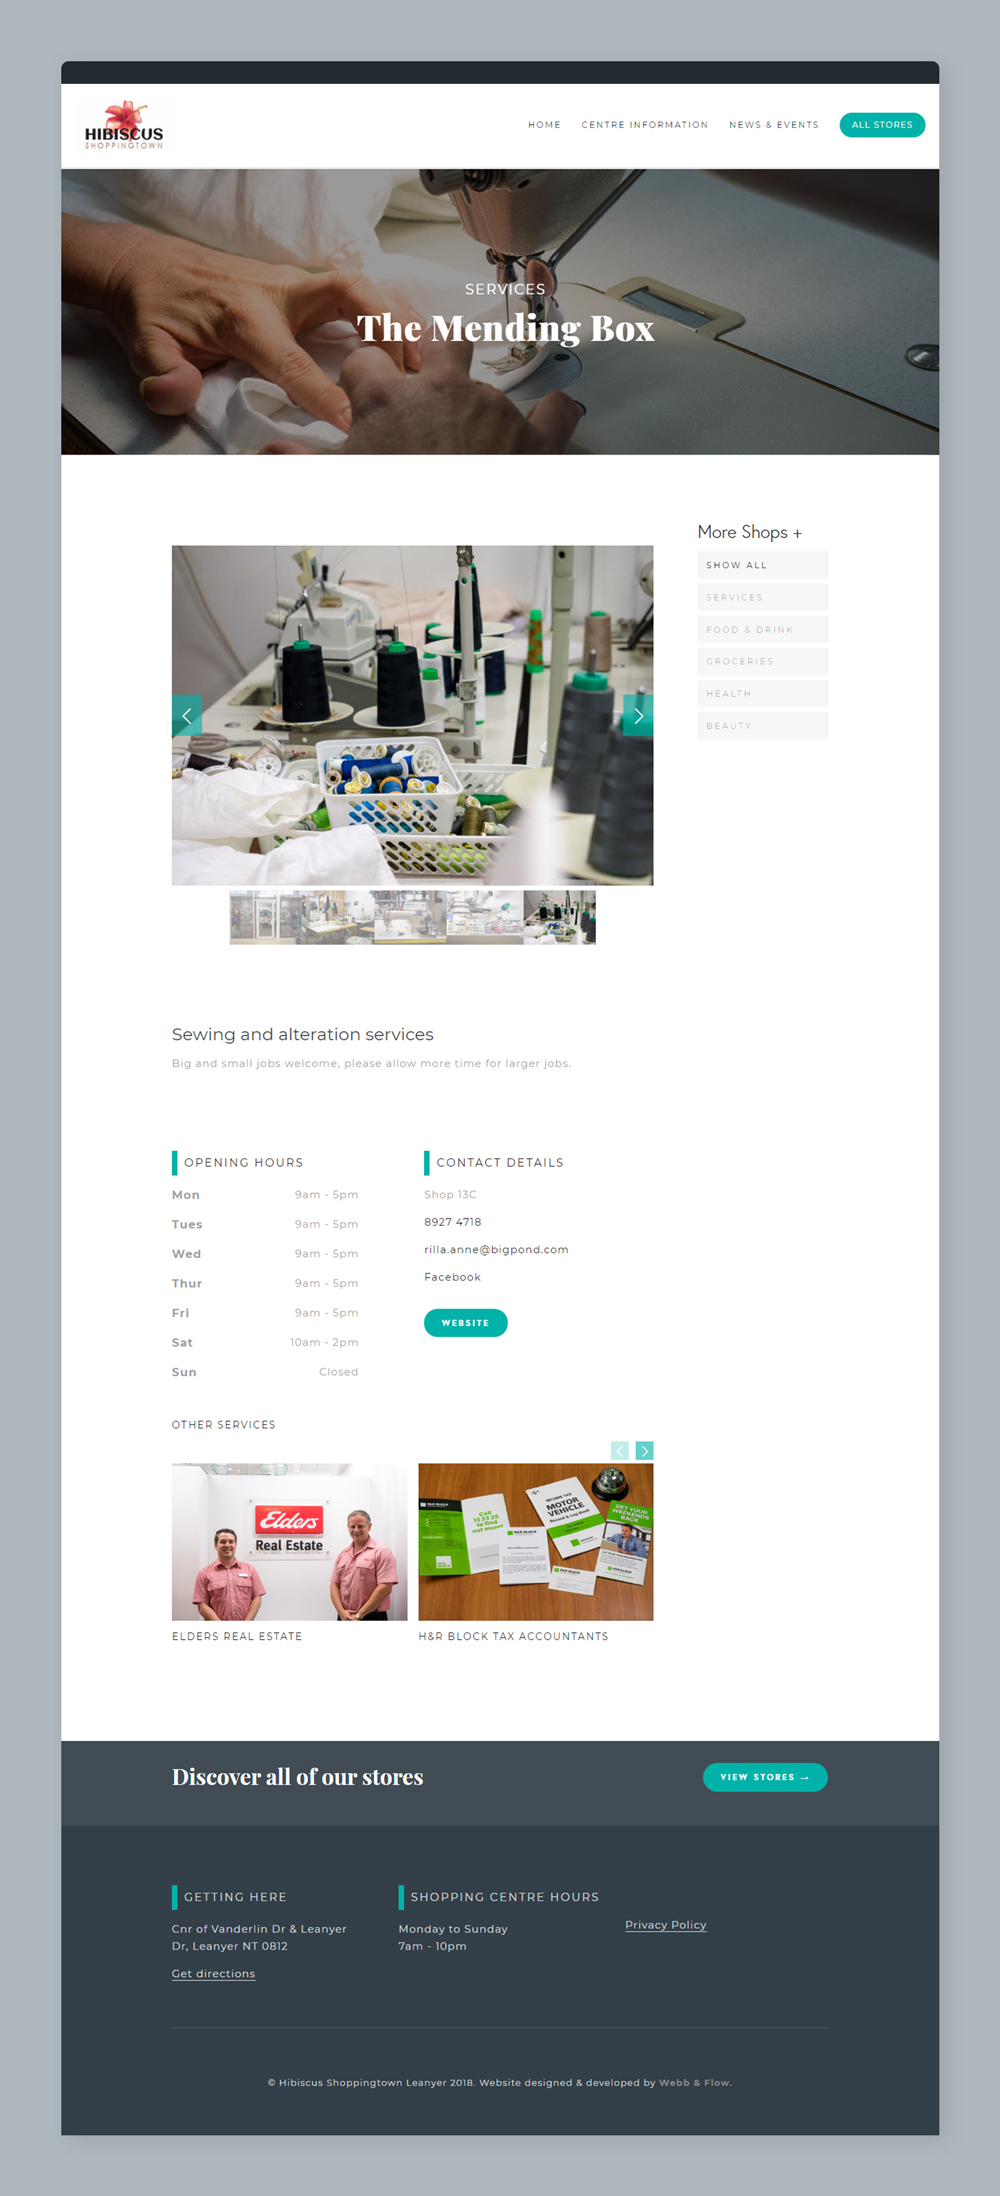 WebbFlow-portfolio-browser-hibiscus5.jpg